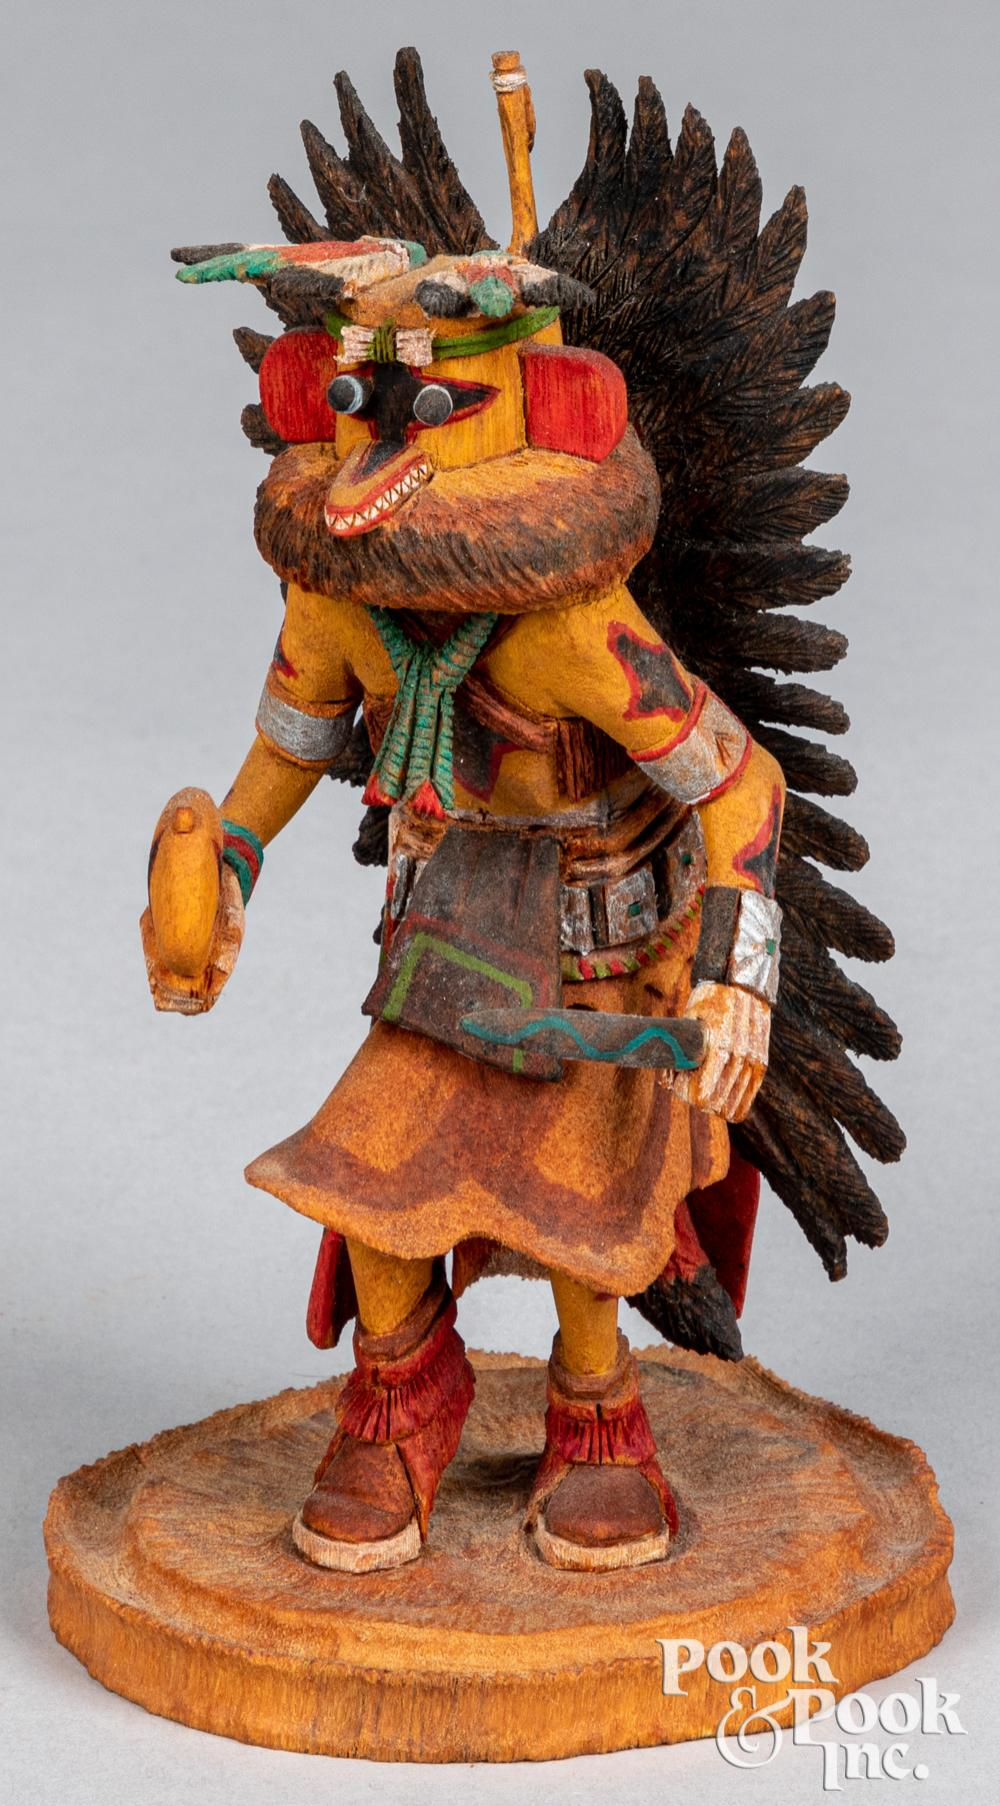 Elgean Joshevama Jr. carved kachina figure